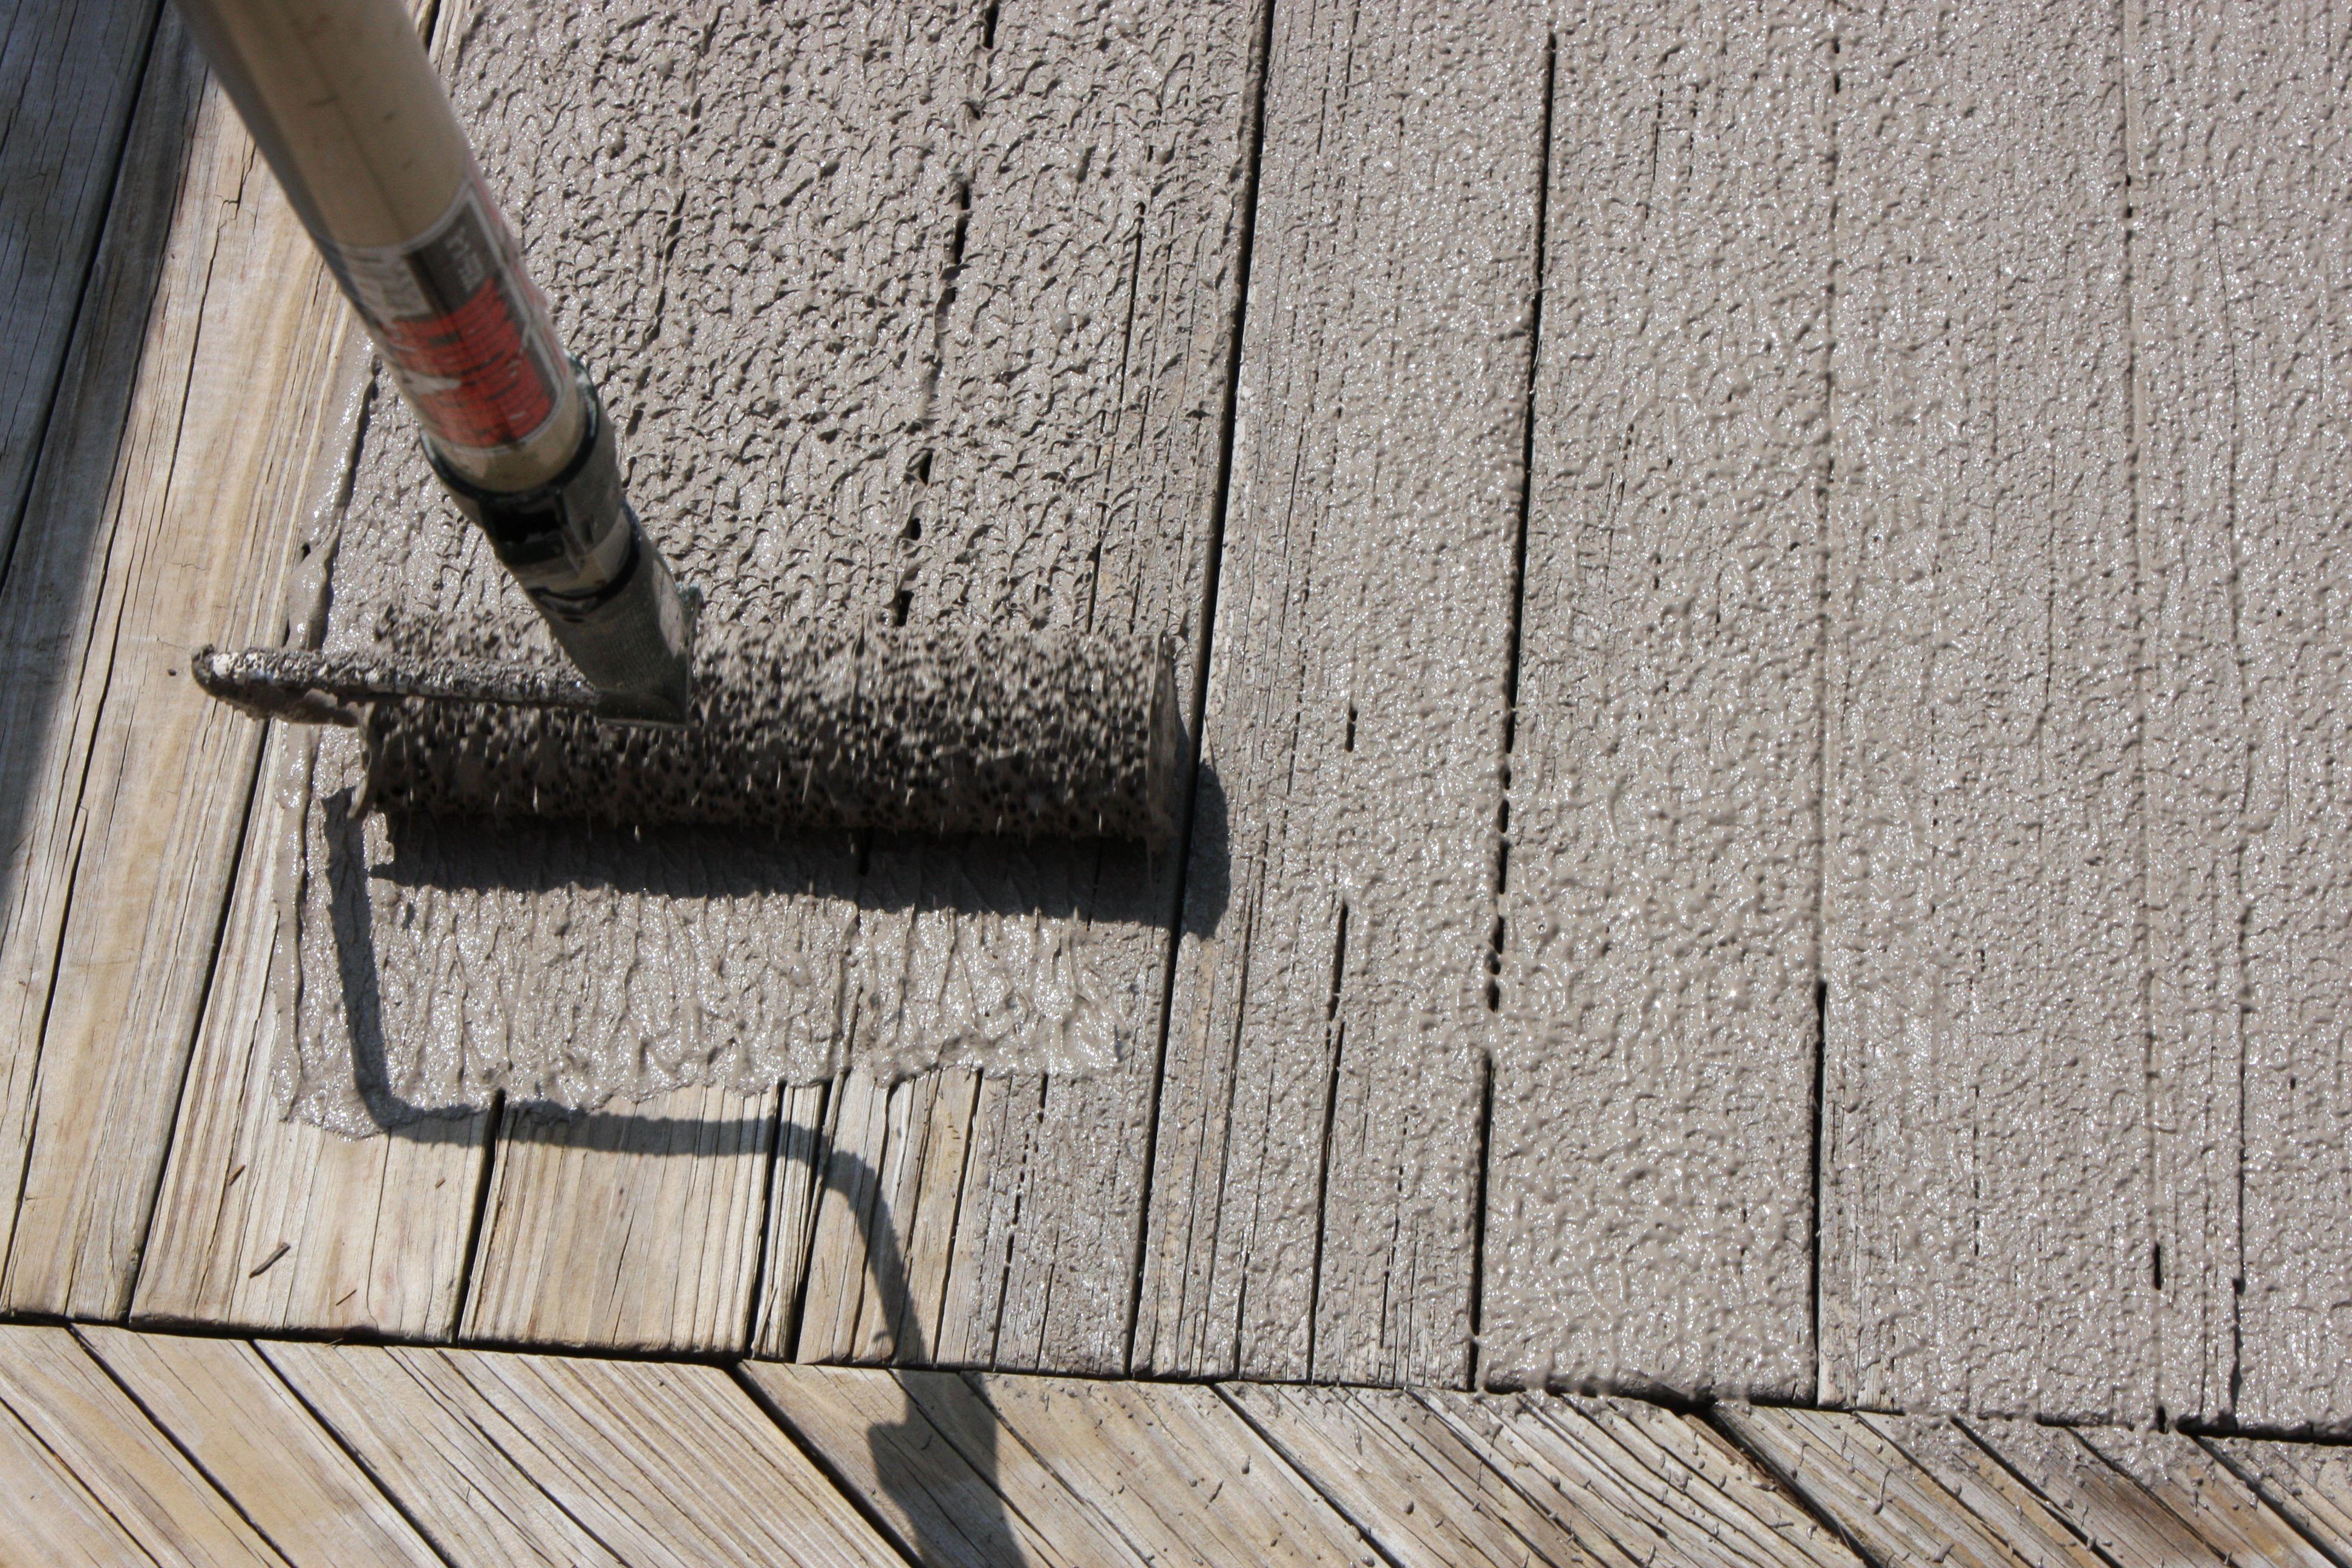 Armorrenew Wood Concrete Resurfacer Deck Refinishing Deck